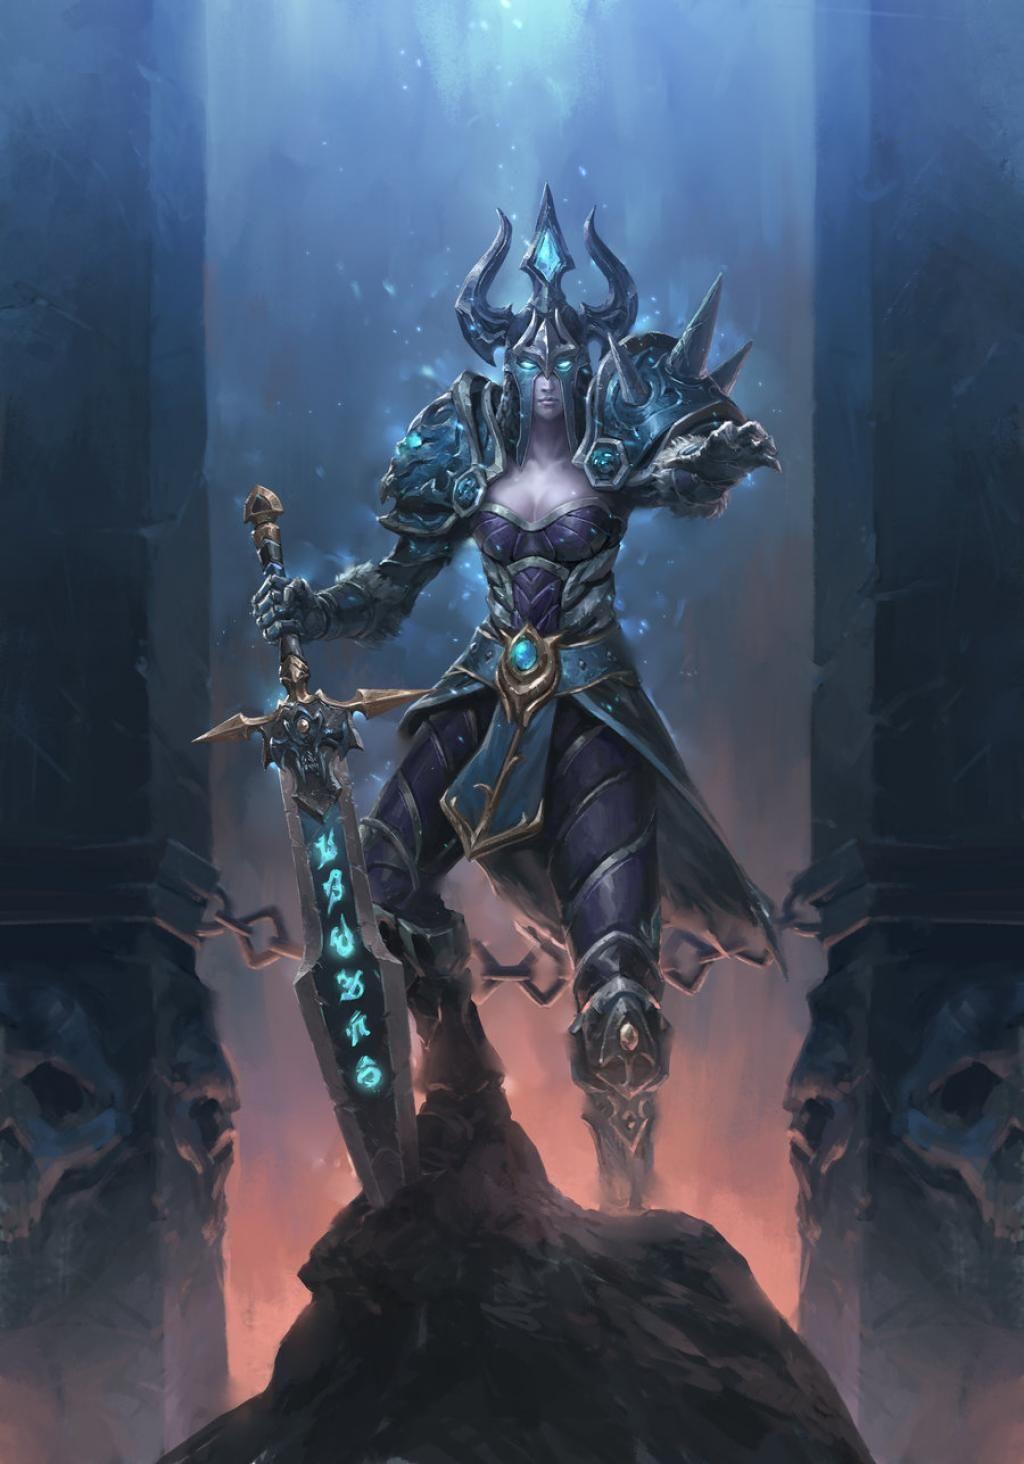 Картинки рыцаря смерти